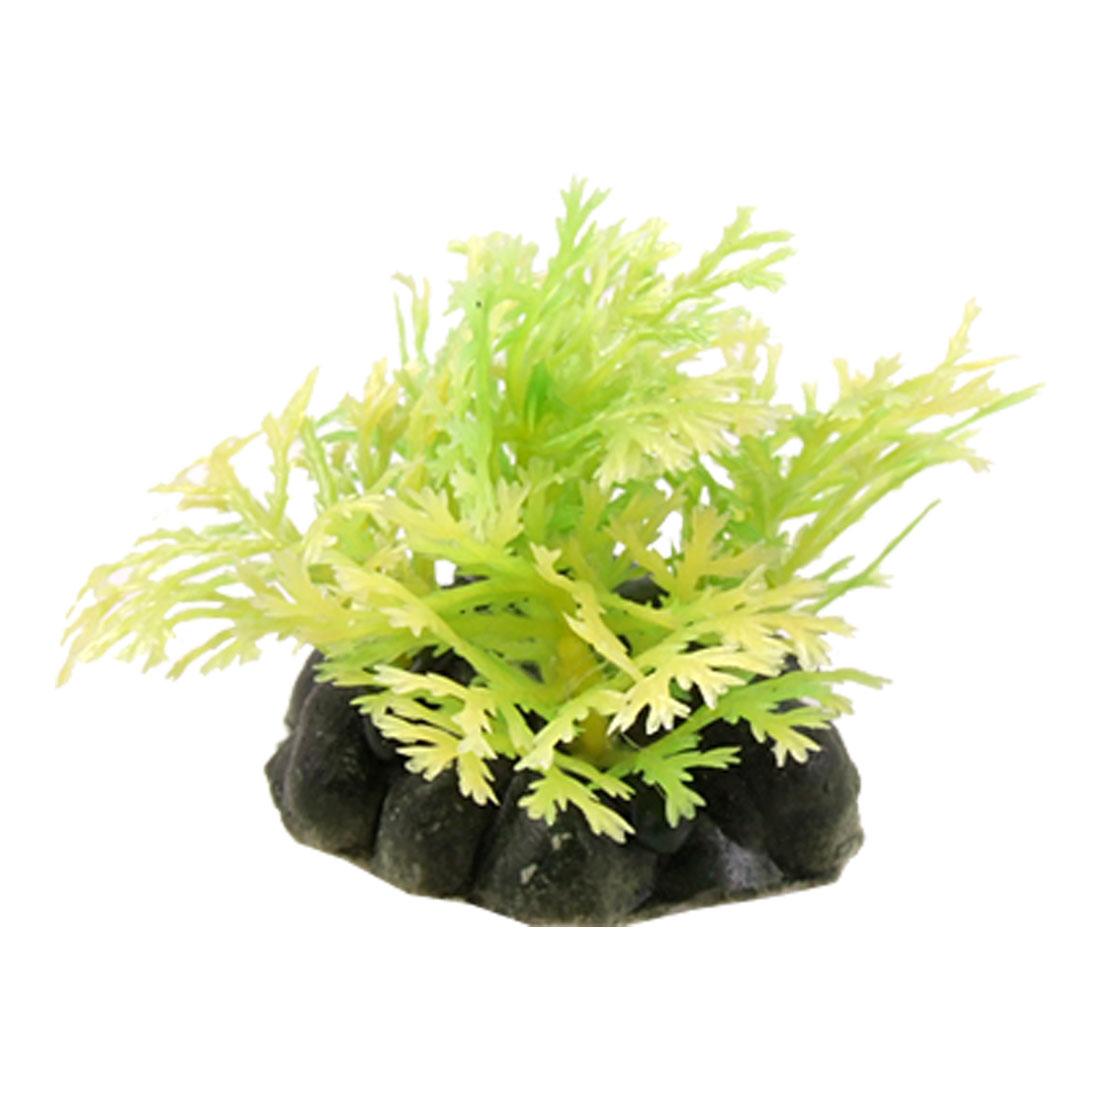 3 Pcs Aquarium Fish Tank Ceramic Base Yellow-green Plastic Plant Decor